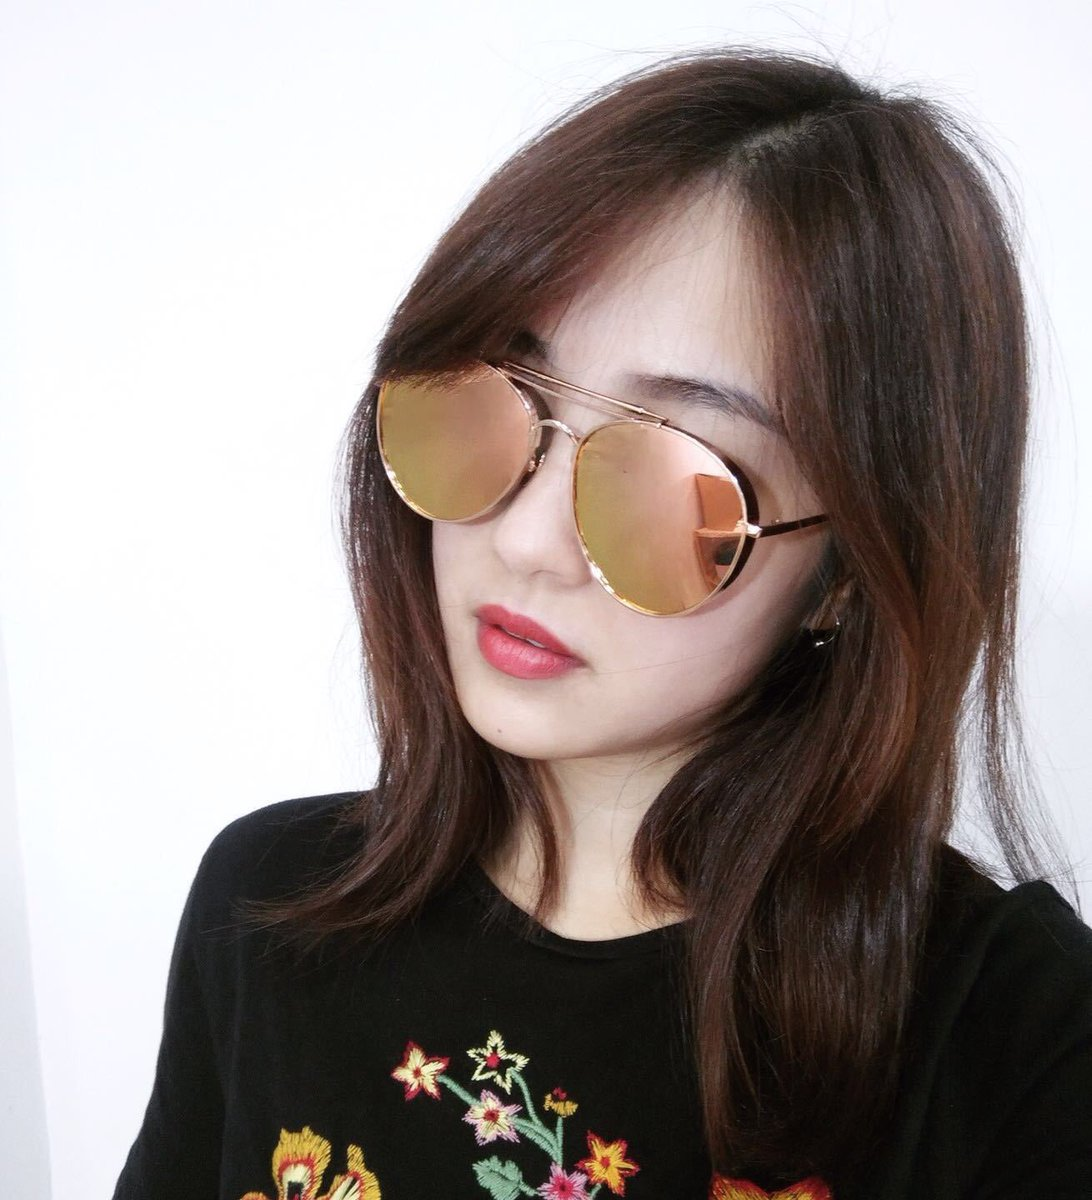 8918f2ddda6  Gentlemonster New Authentic Gentle Monster Big Bully Rose Gold Frame Pink  Lens Sunglasses See  http   ebay.to 2qJg3ro pic.twitter.com mPeTnOMKWv